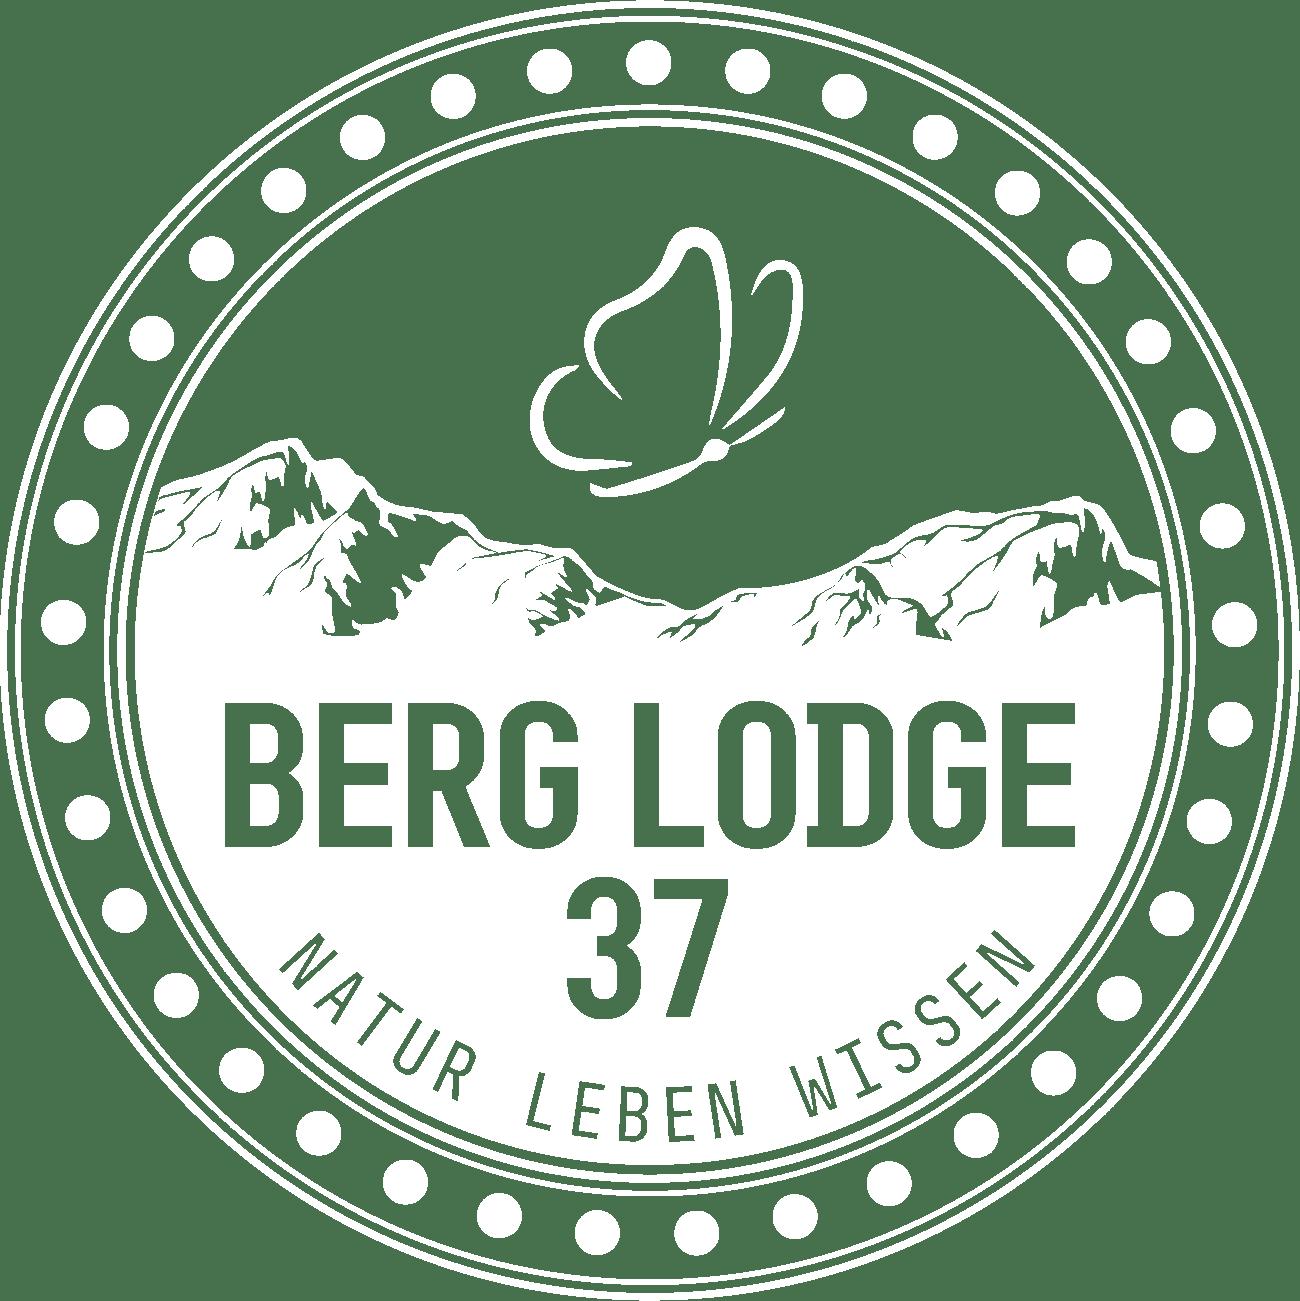 berglodge-logo-white